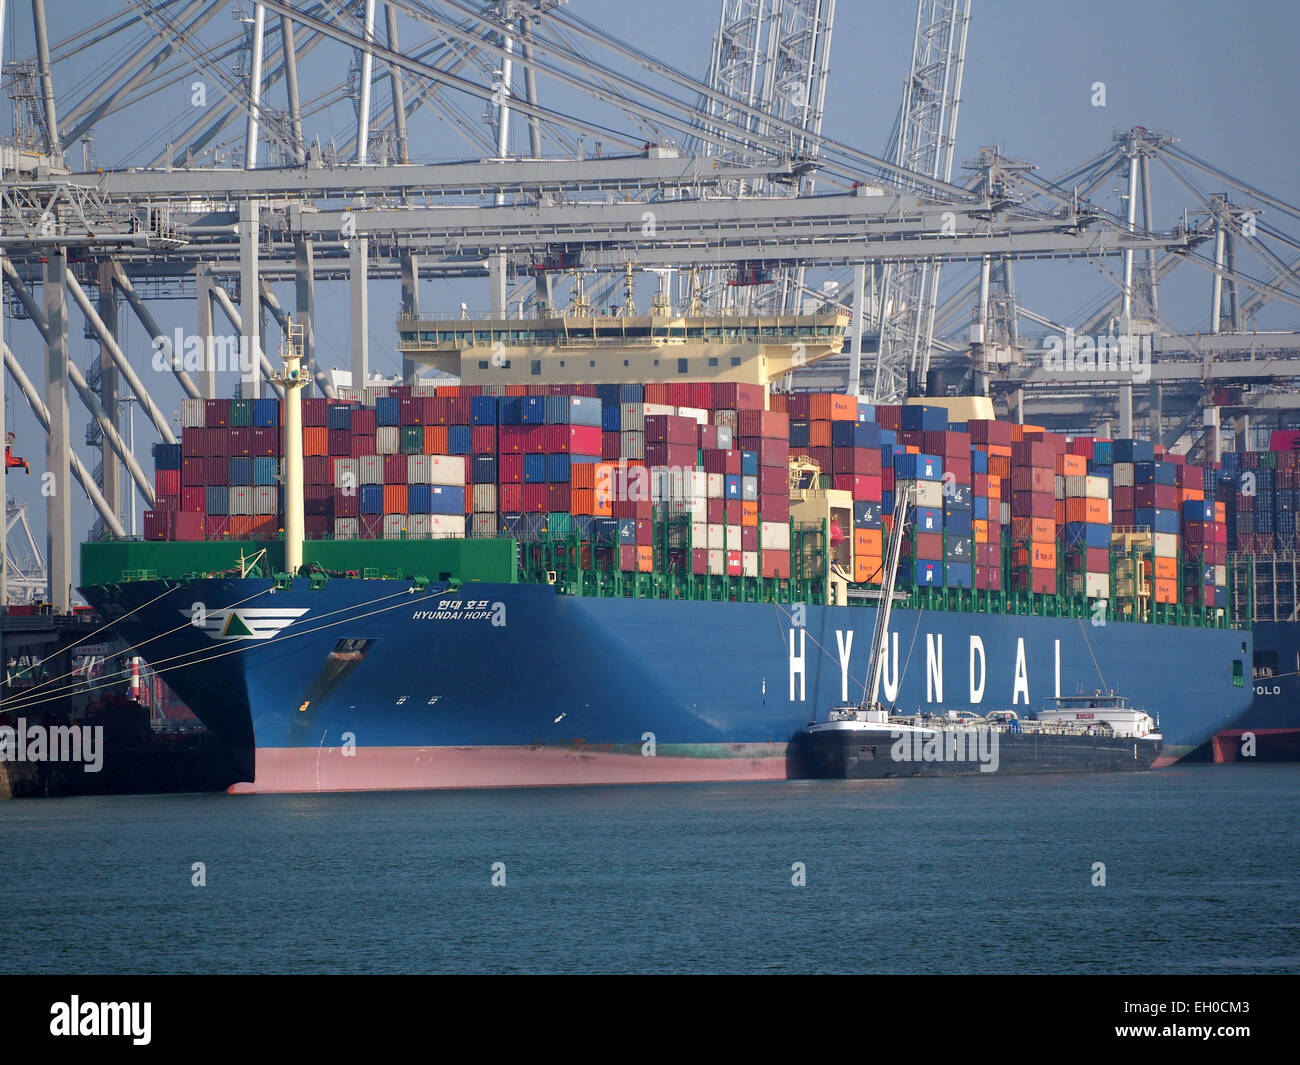 Hyundai Hope - IMO 9637234 & Atlantic Prestige ENI 02333489, Amazonehaven, Port of Rotterdam, pic5 - Stock Image